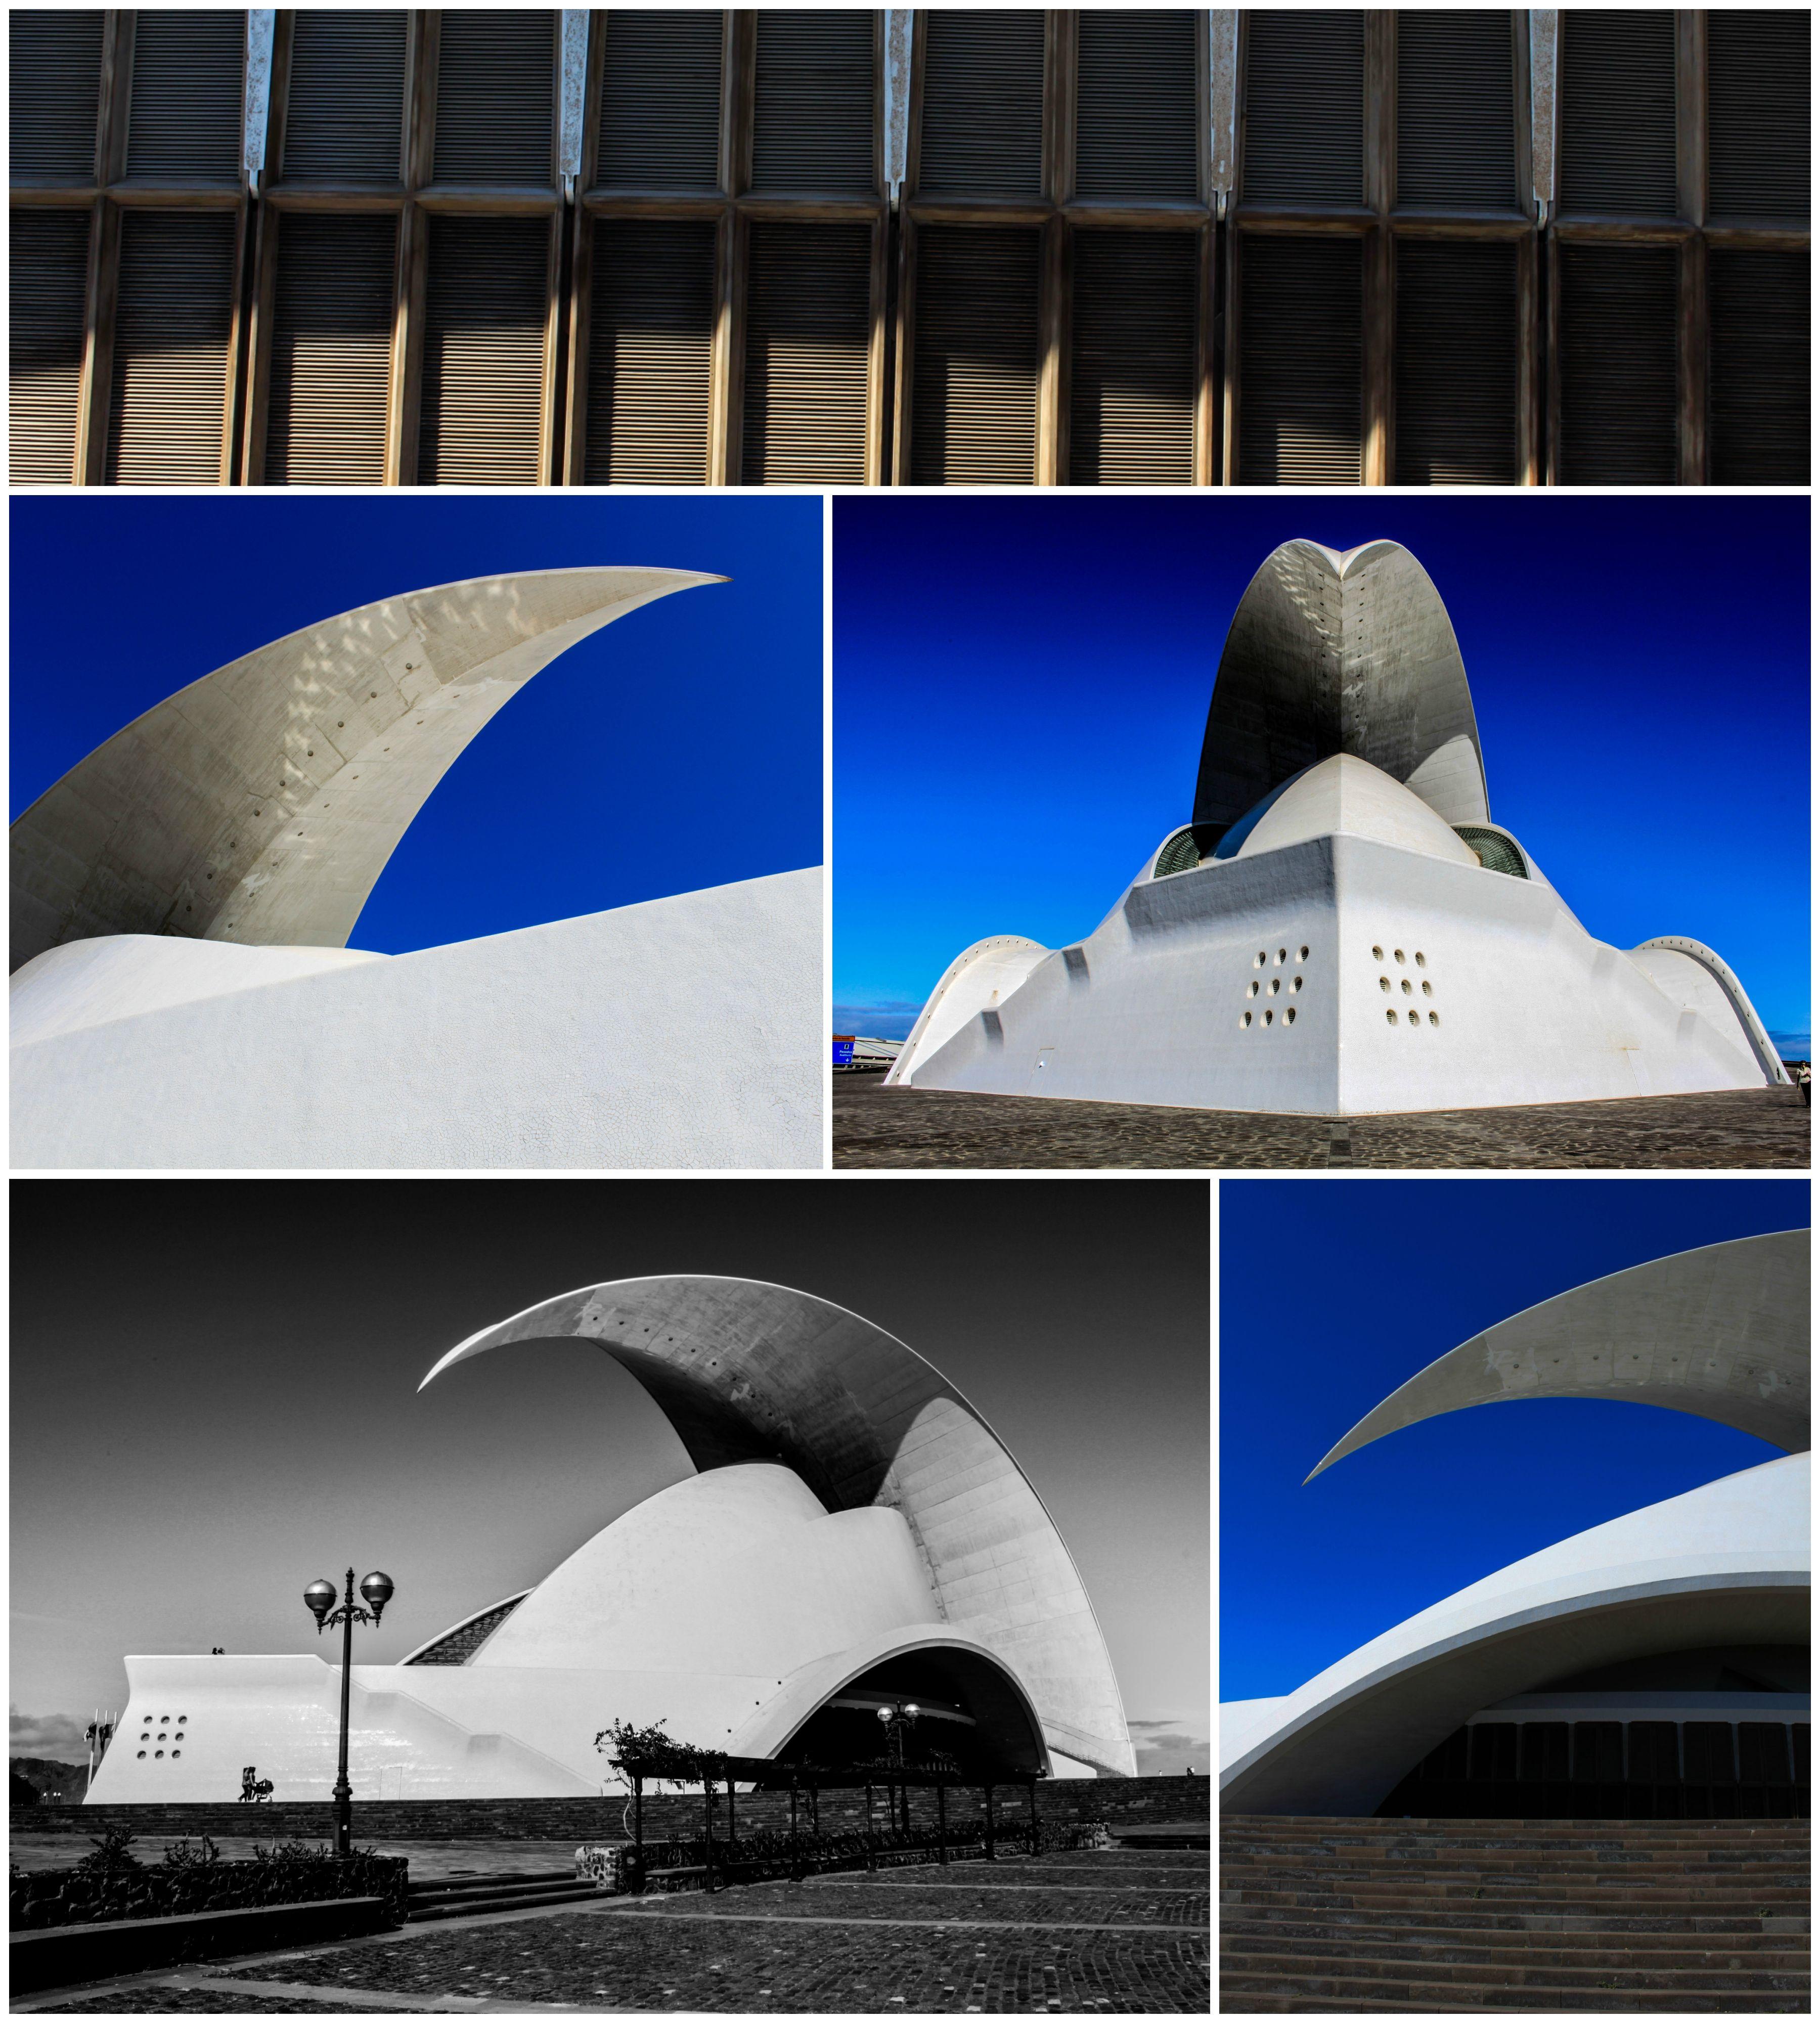 Adan Martin Auditorio de Tenerife by Santiago Calatrava